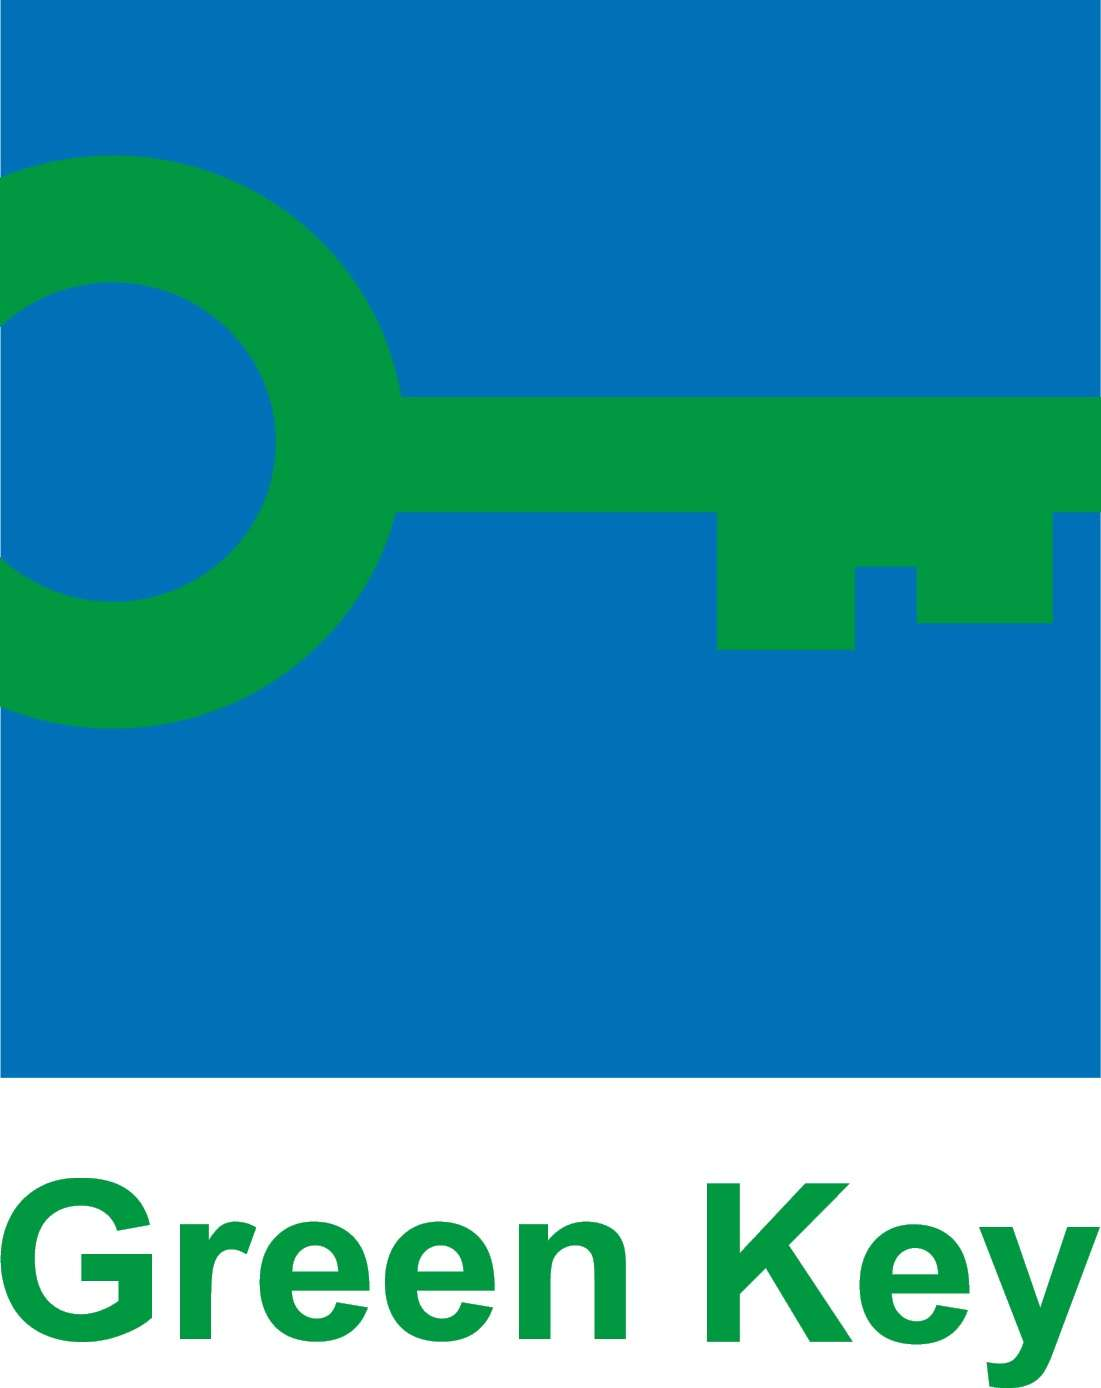 Green Key – Den Grønne Nøgle